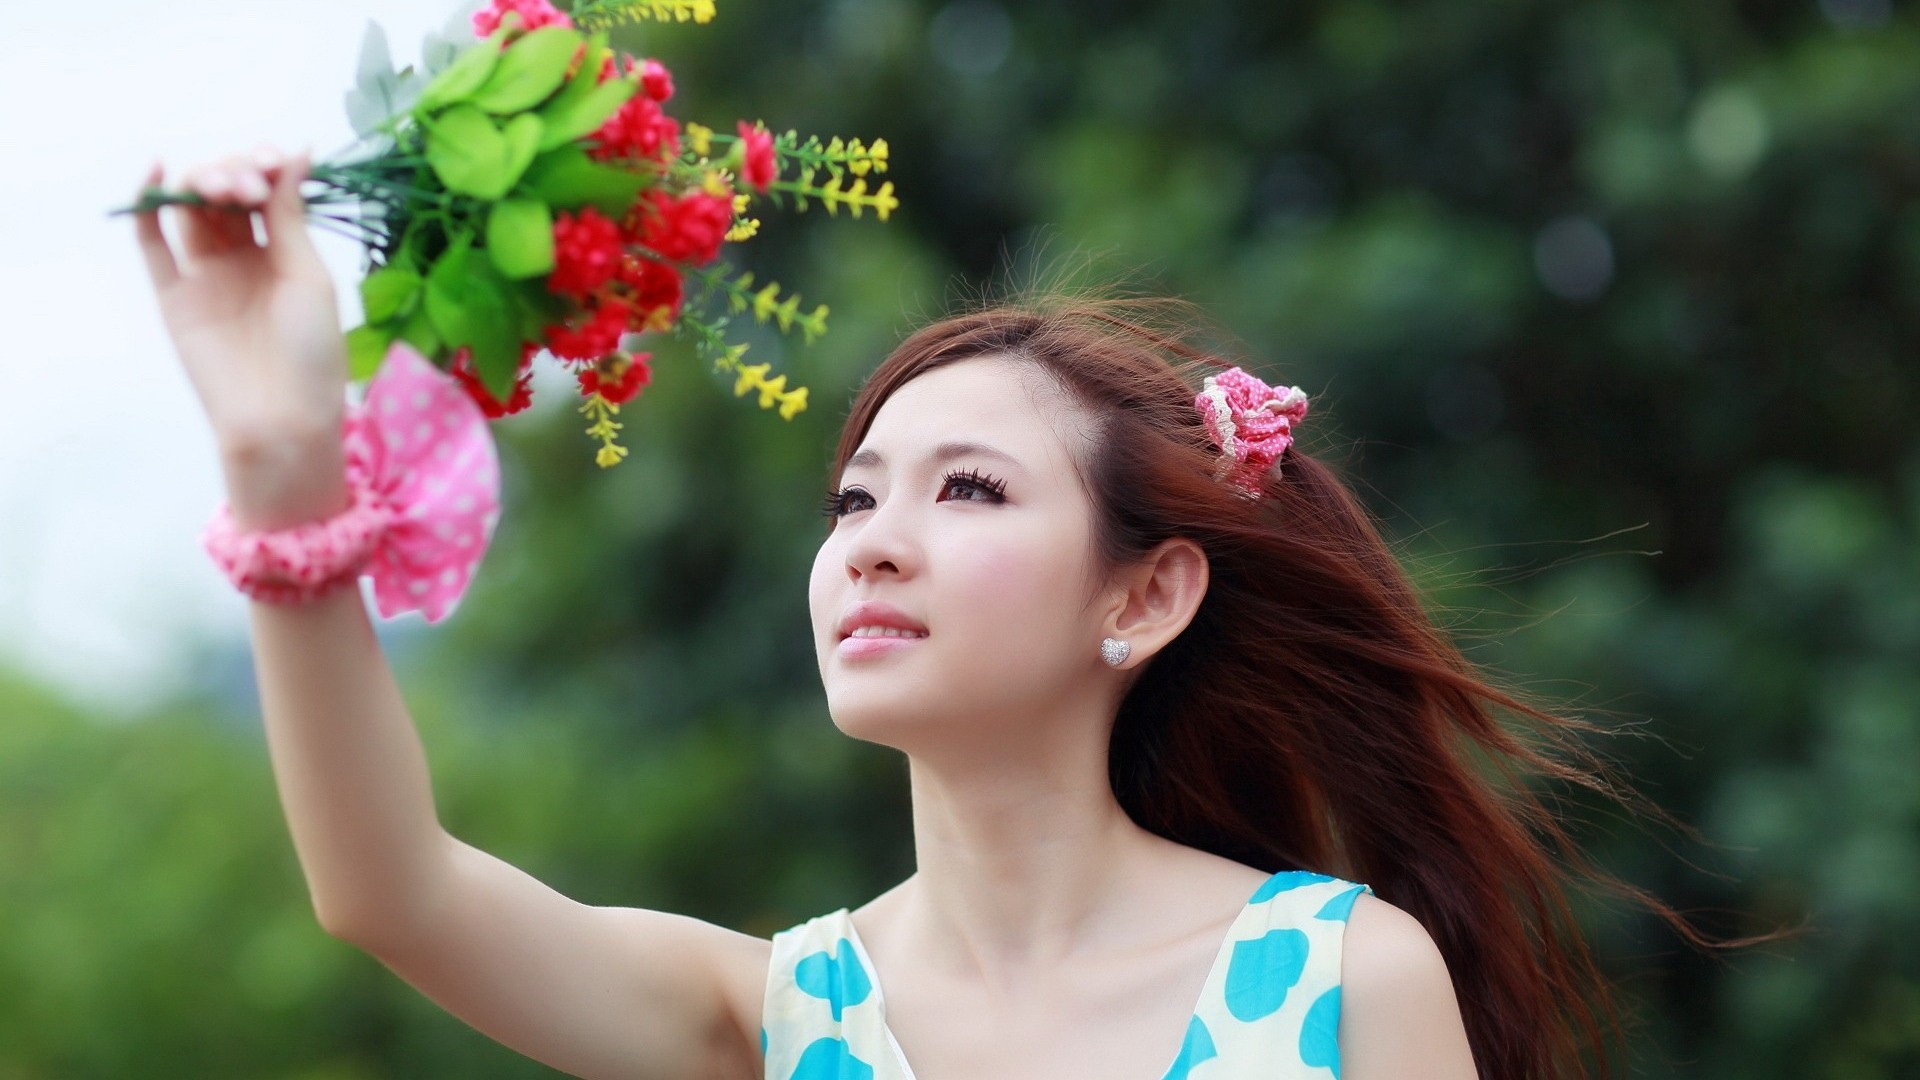 Wallpaper women model red Asian dress hair spring Person 1920x1080